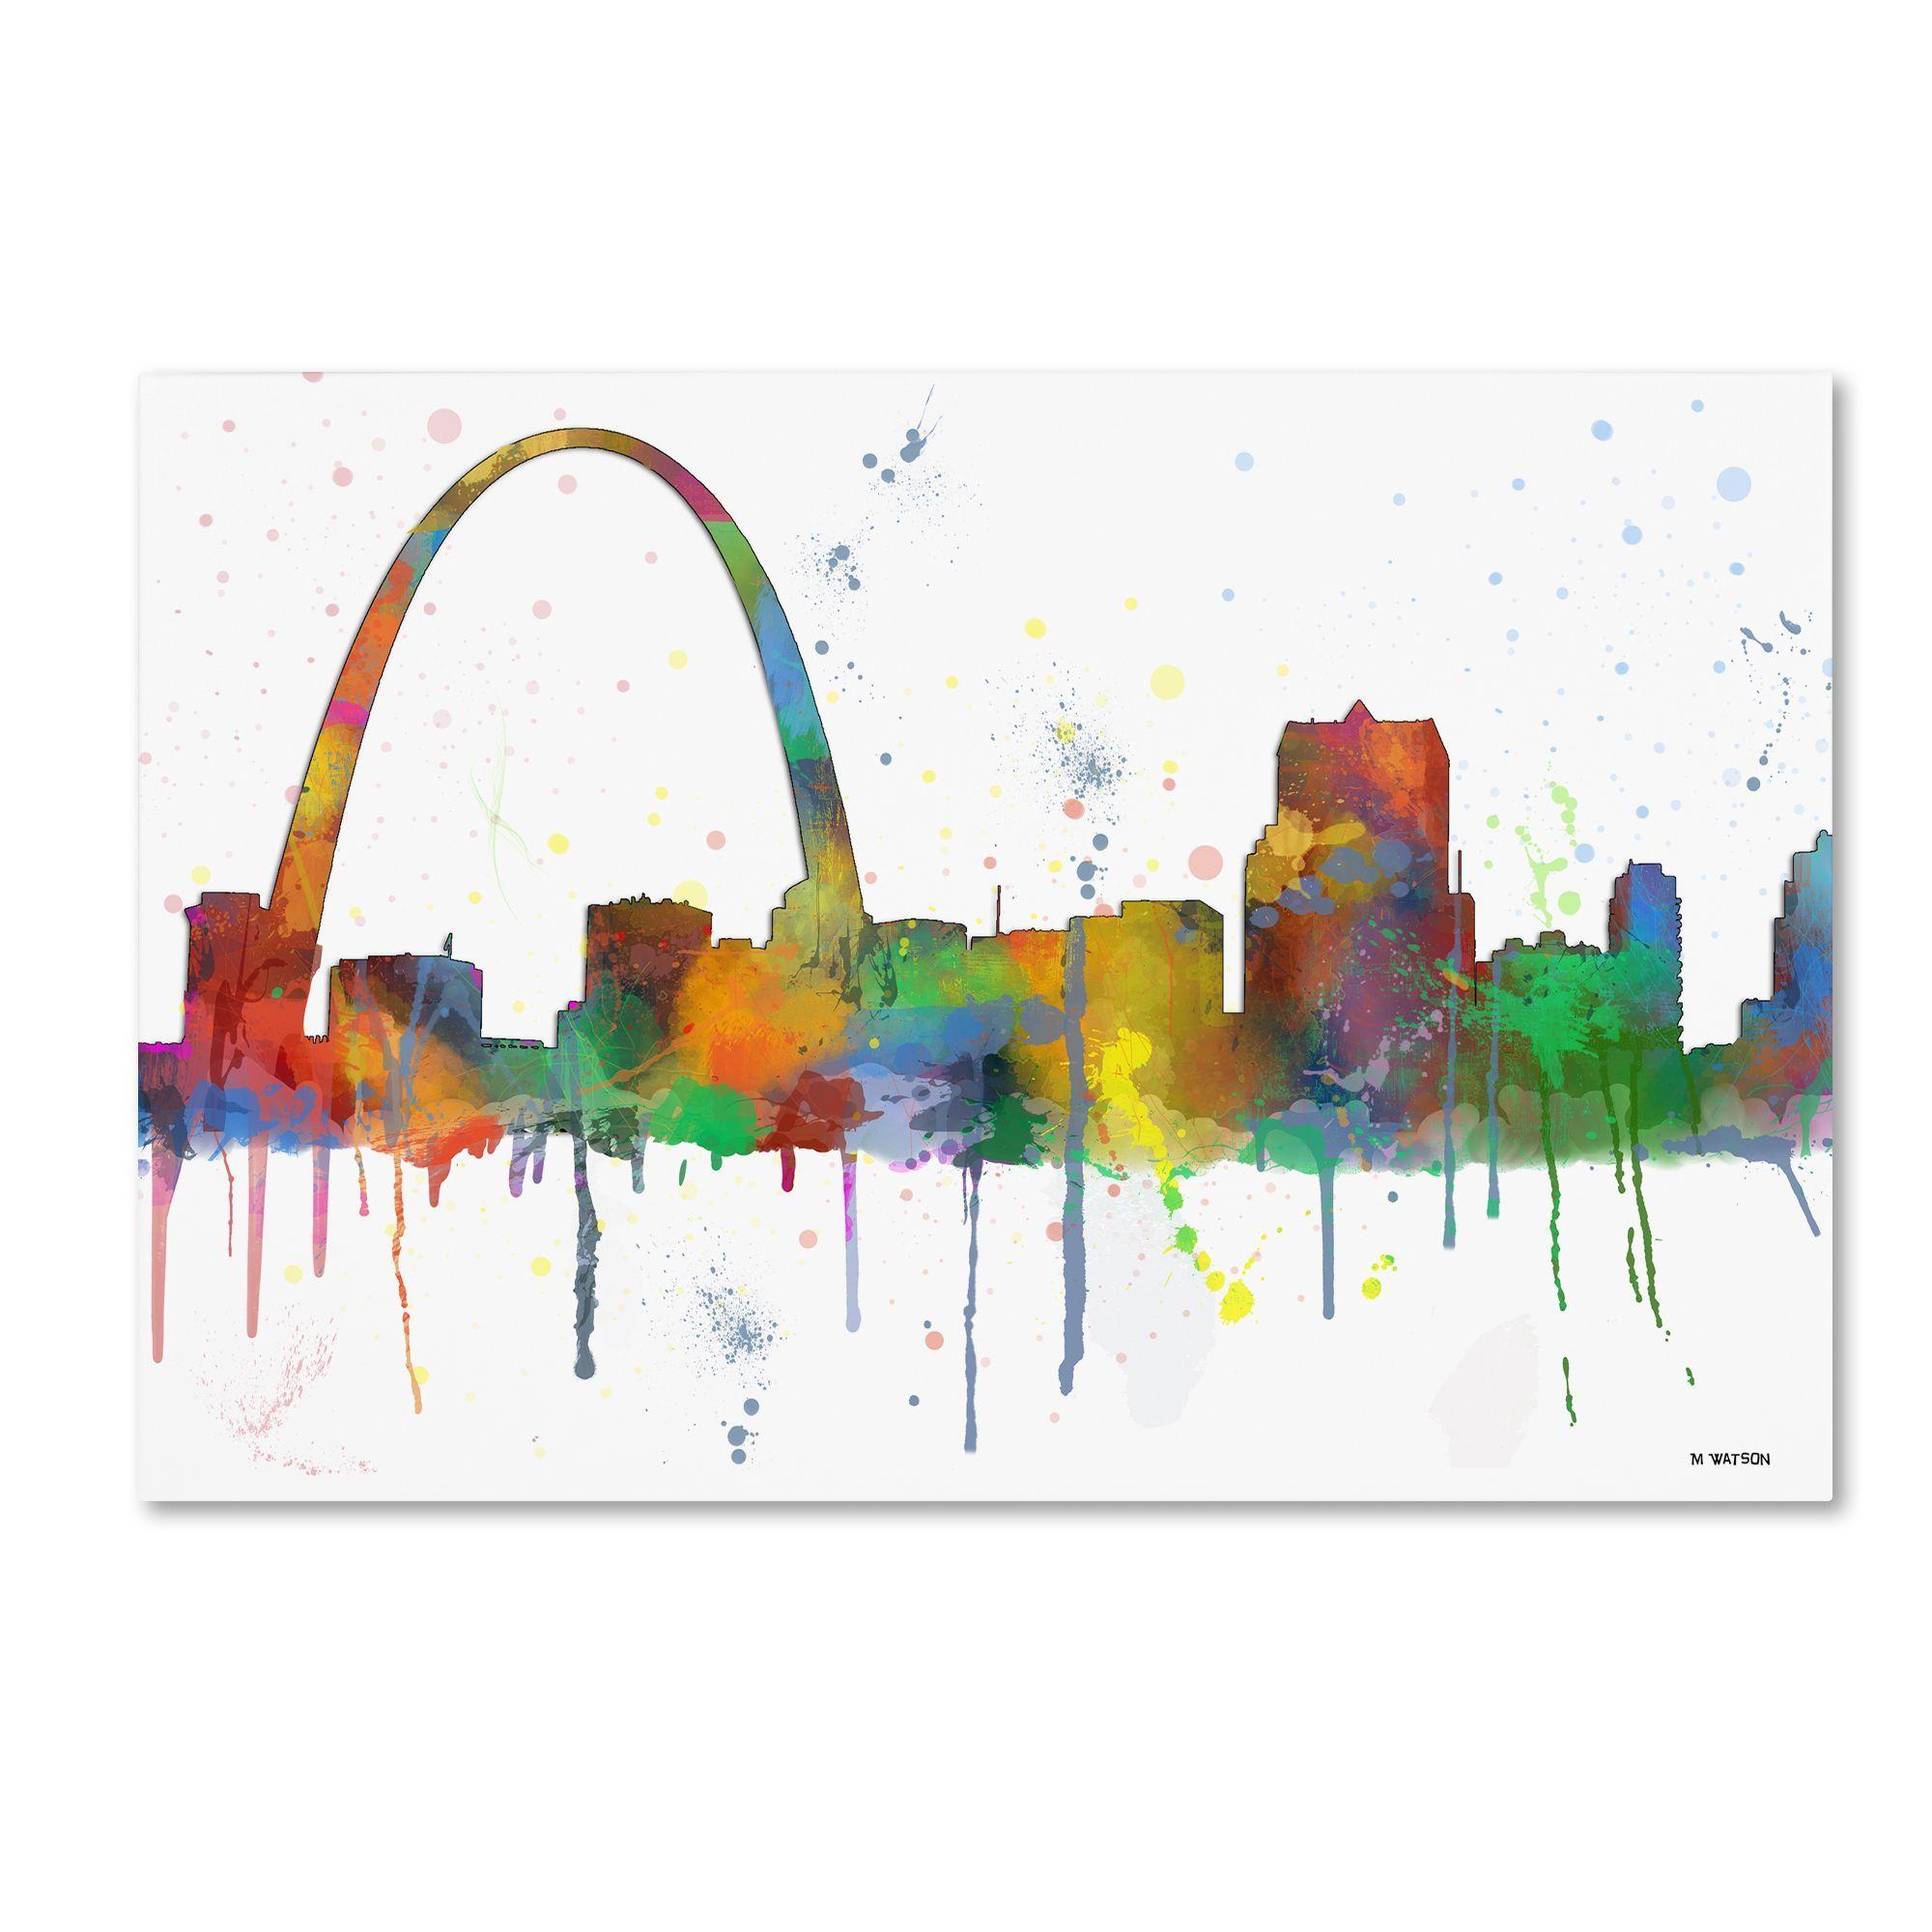 Marlene Watson 'Gateway Arch St Louis Skyline Mclr-1' Canvas Art